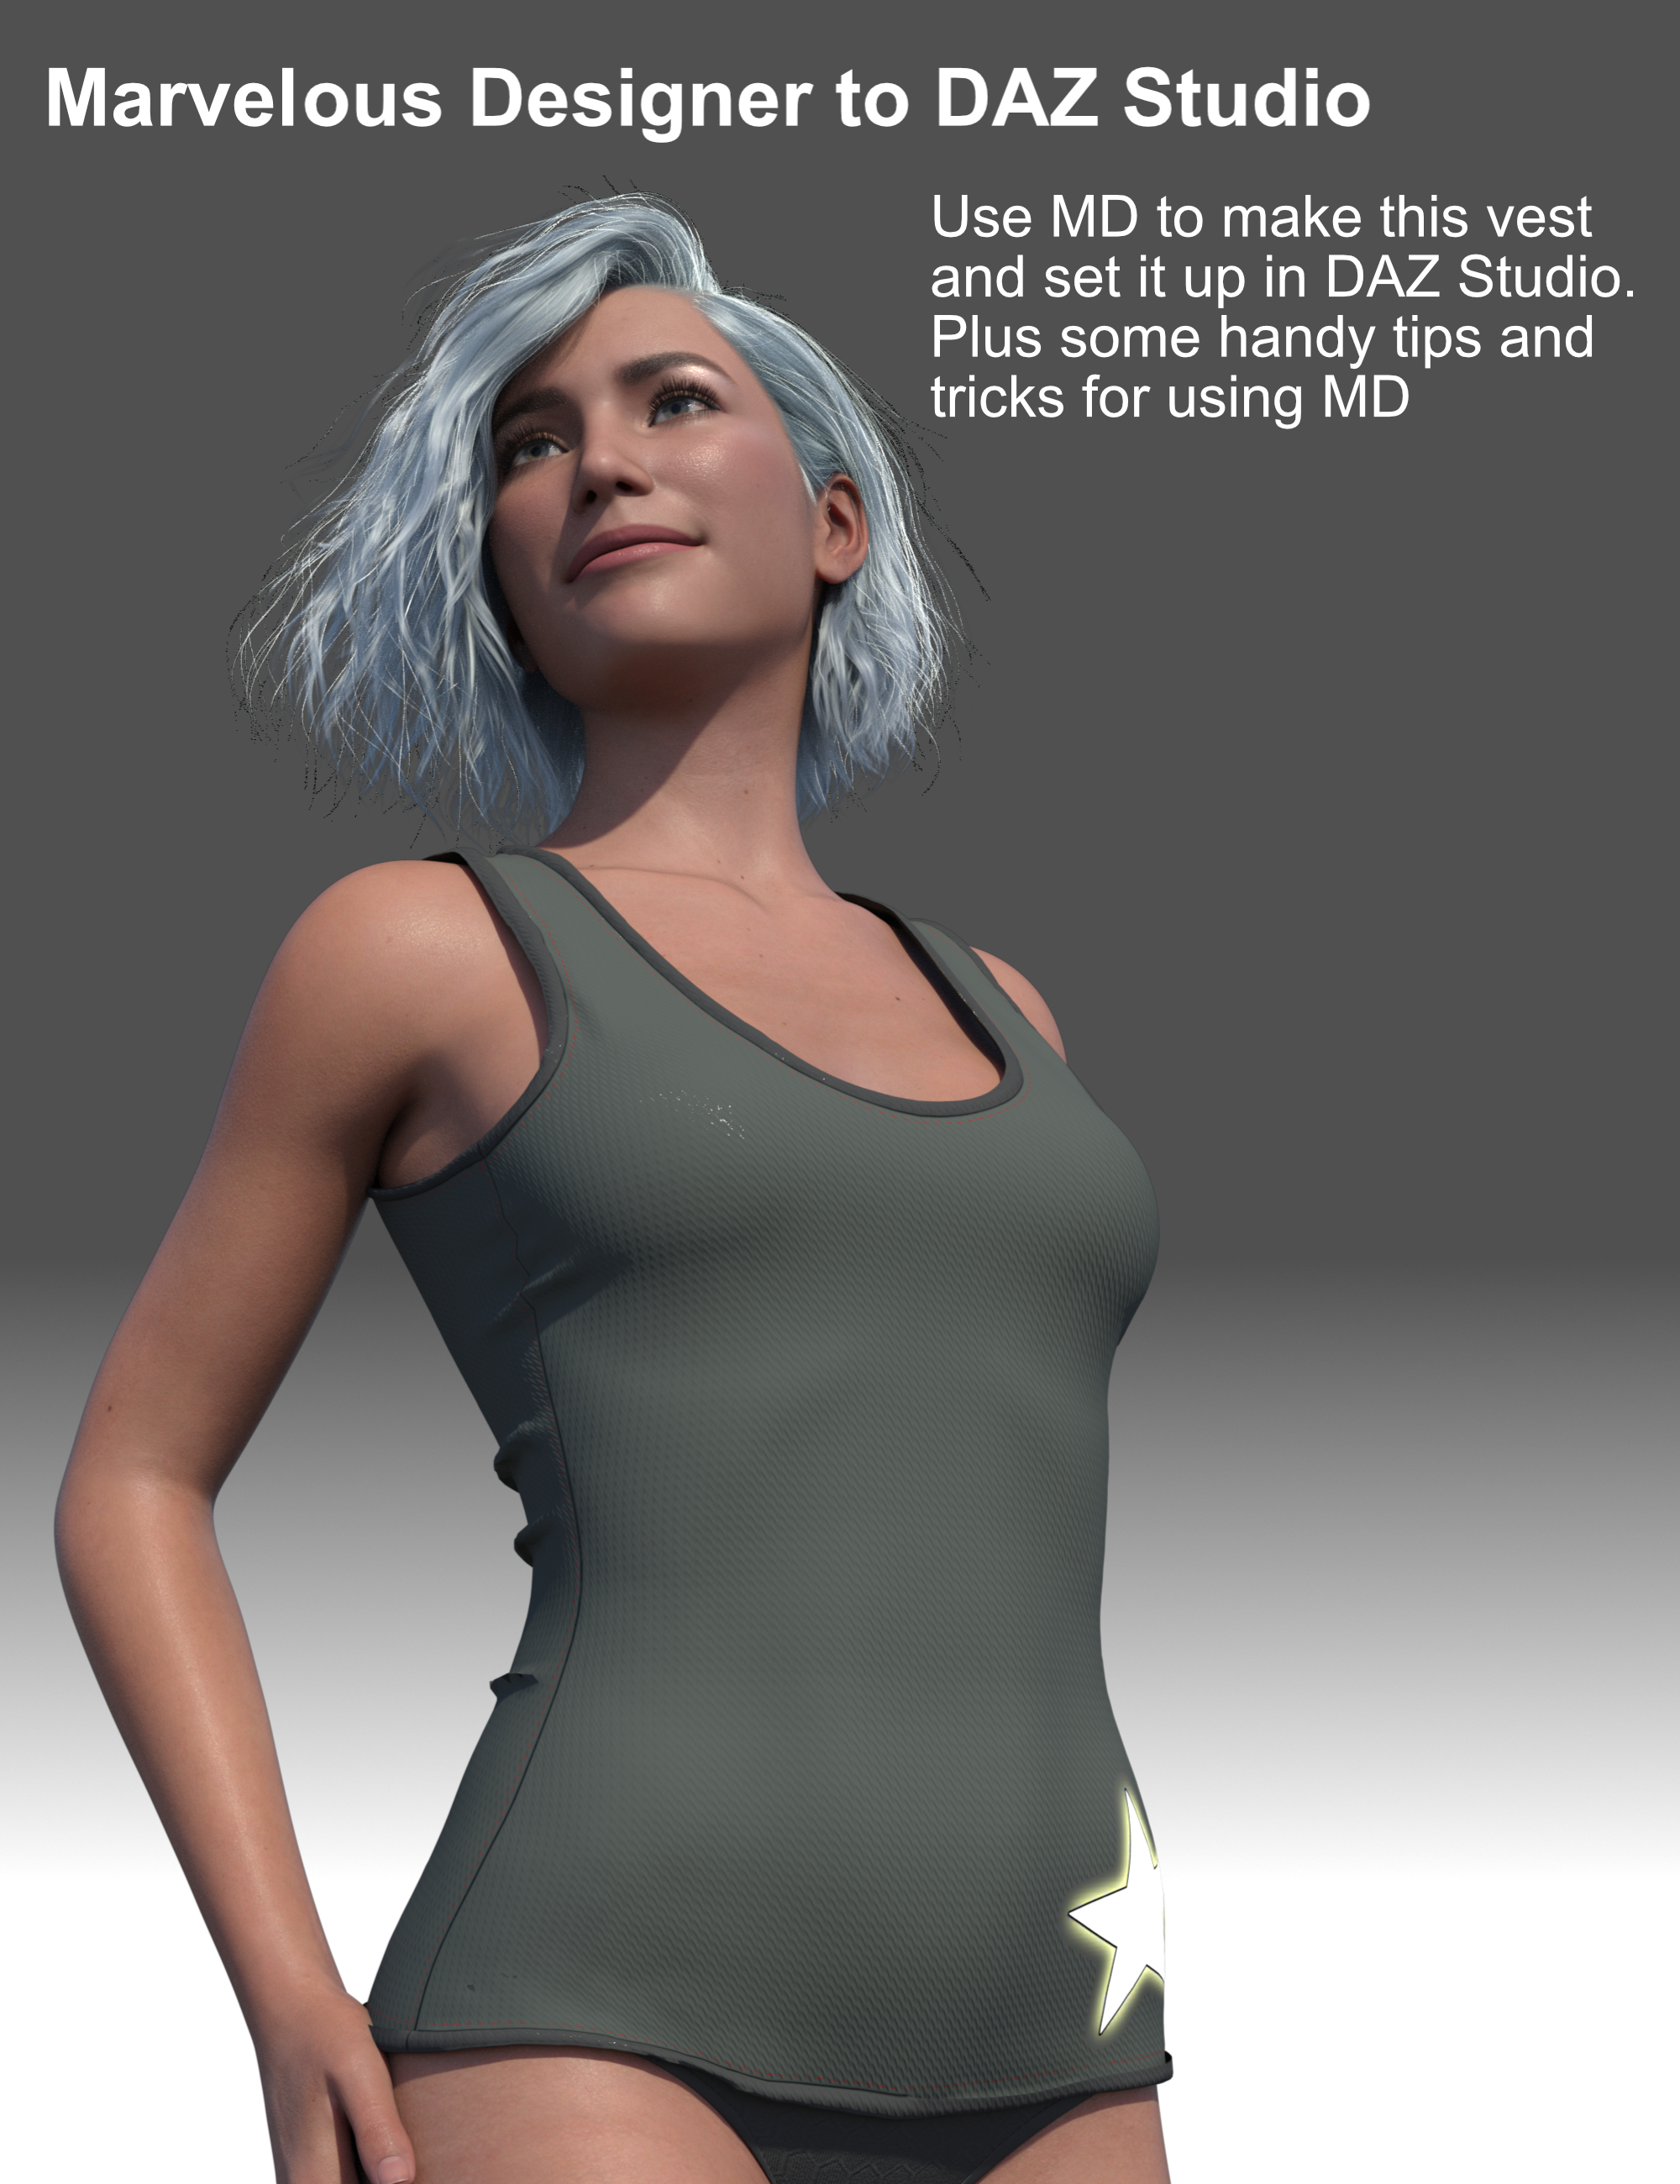 FG Marvelous Designer to Daz Studio Video Tutorial by: Fugazi1968, 3D Models by Daz 3D